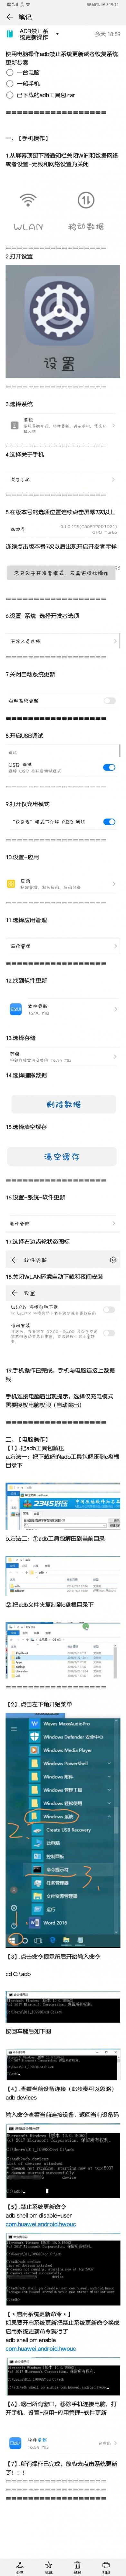 Screenshot_20191107_191154_com.example.android.notepad.jpg